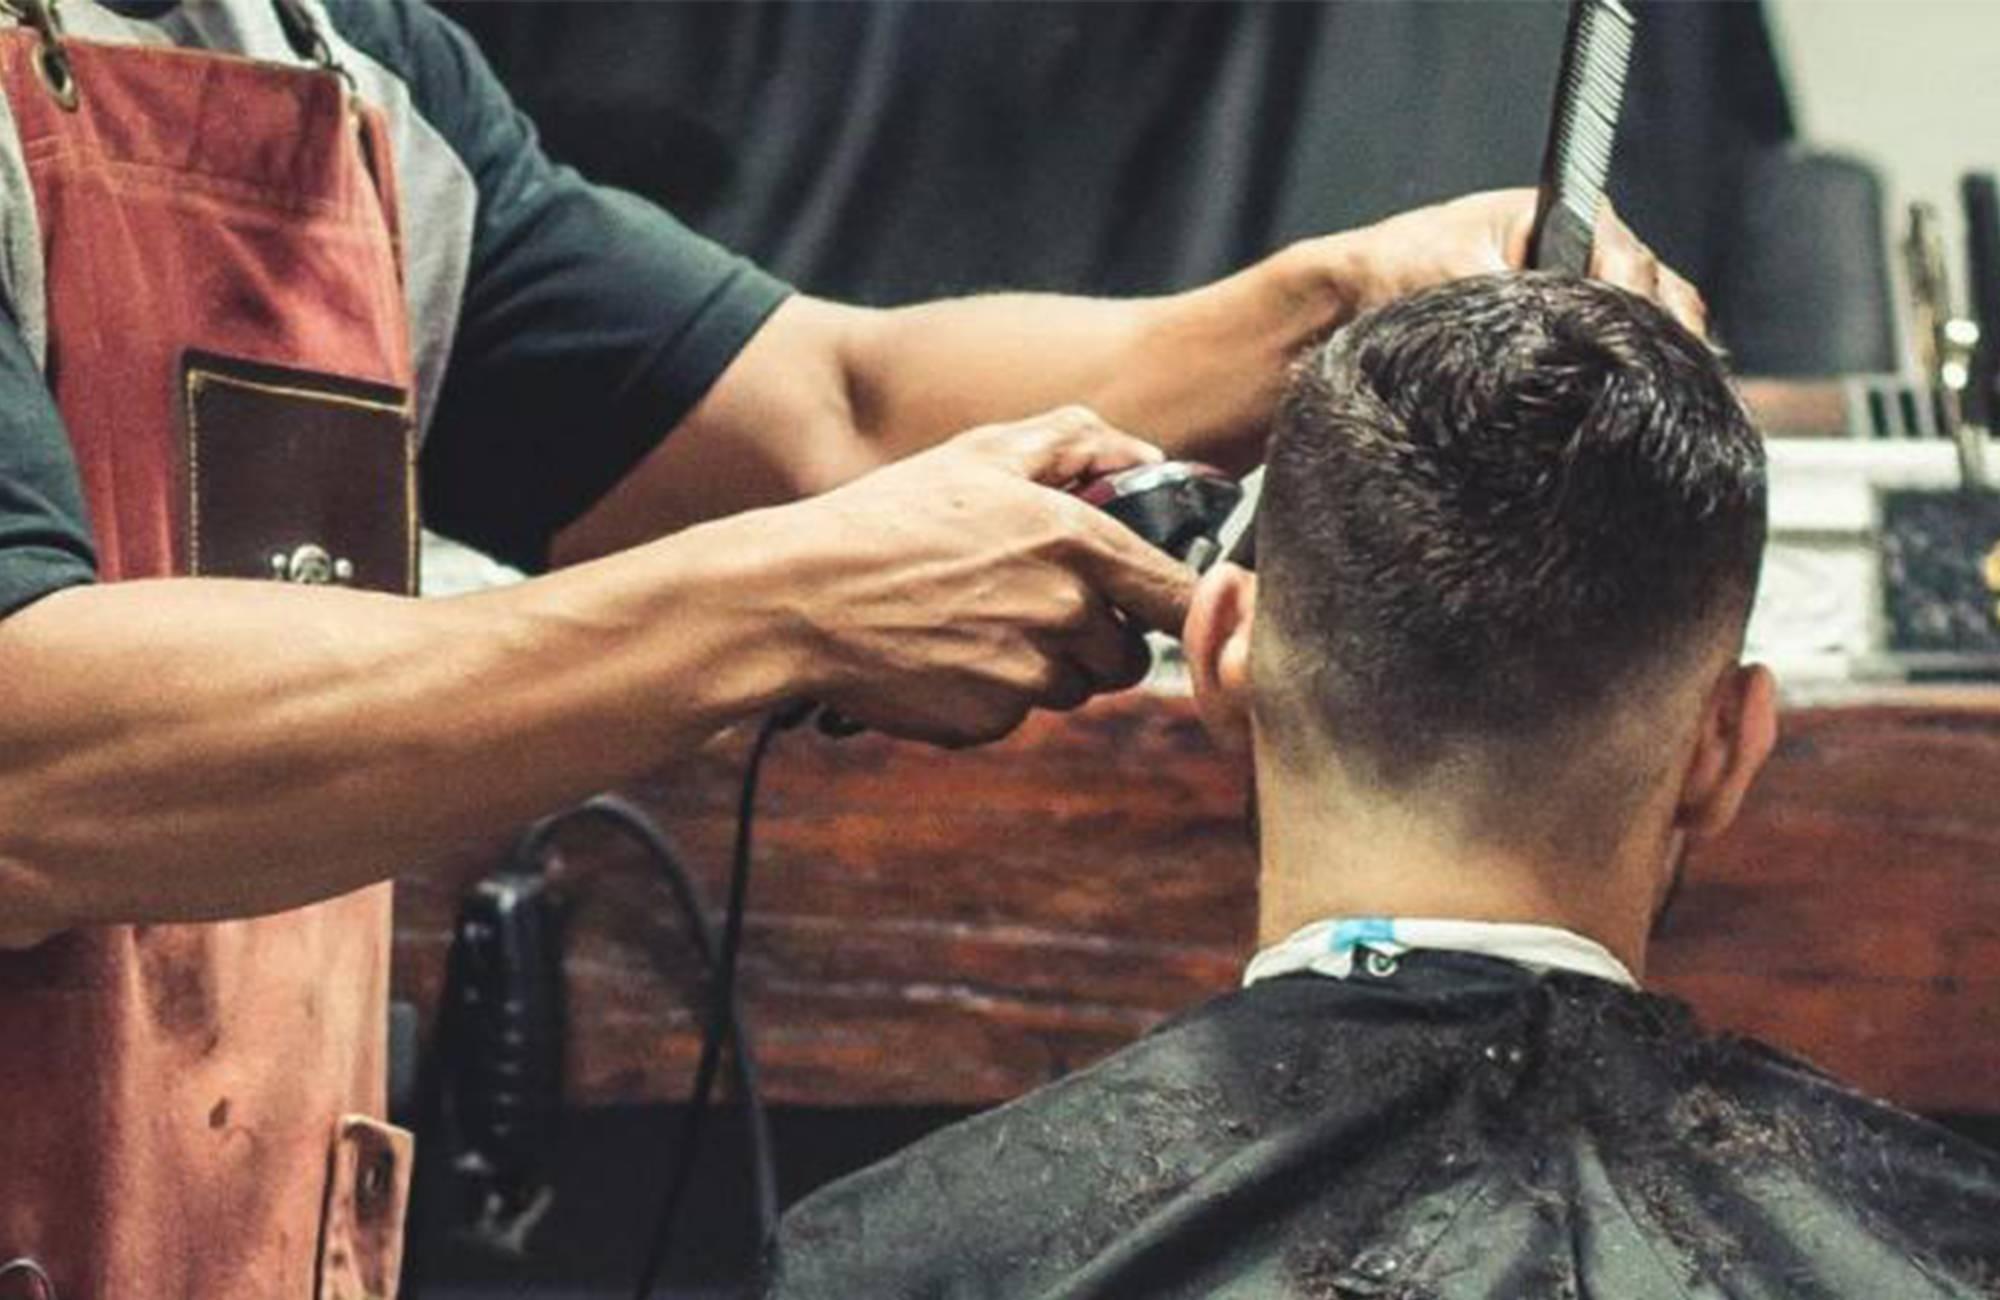 Hair & Barber